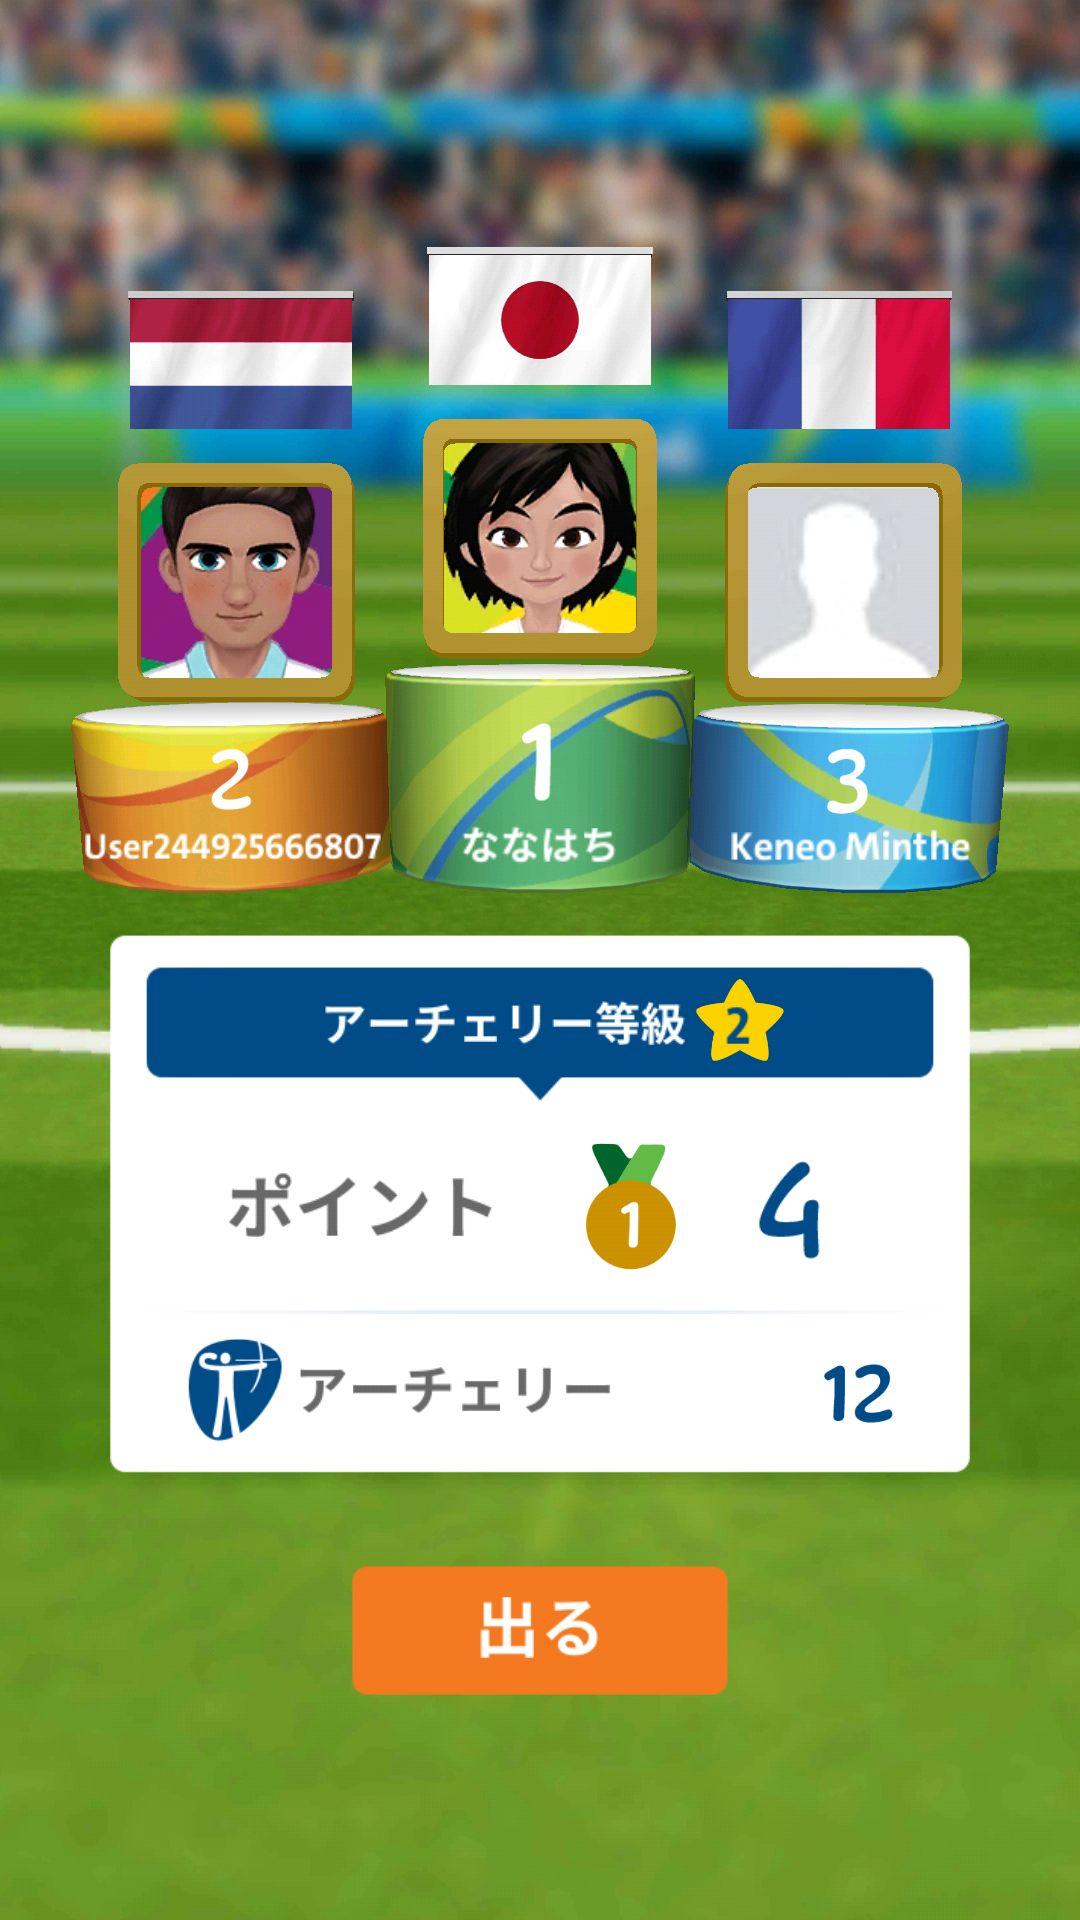 androidアプリ リオ2016オリンピック ゲームズ攻略スクリーンショット4